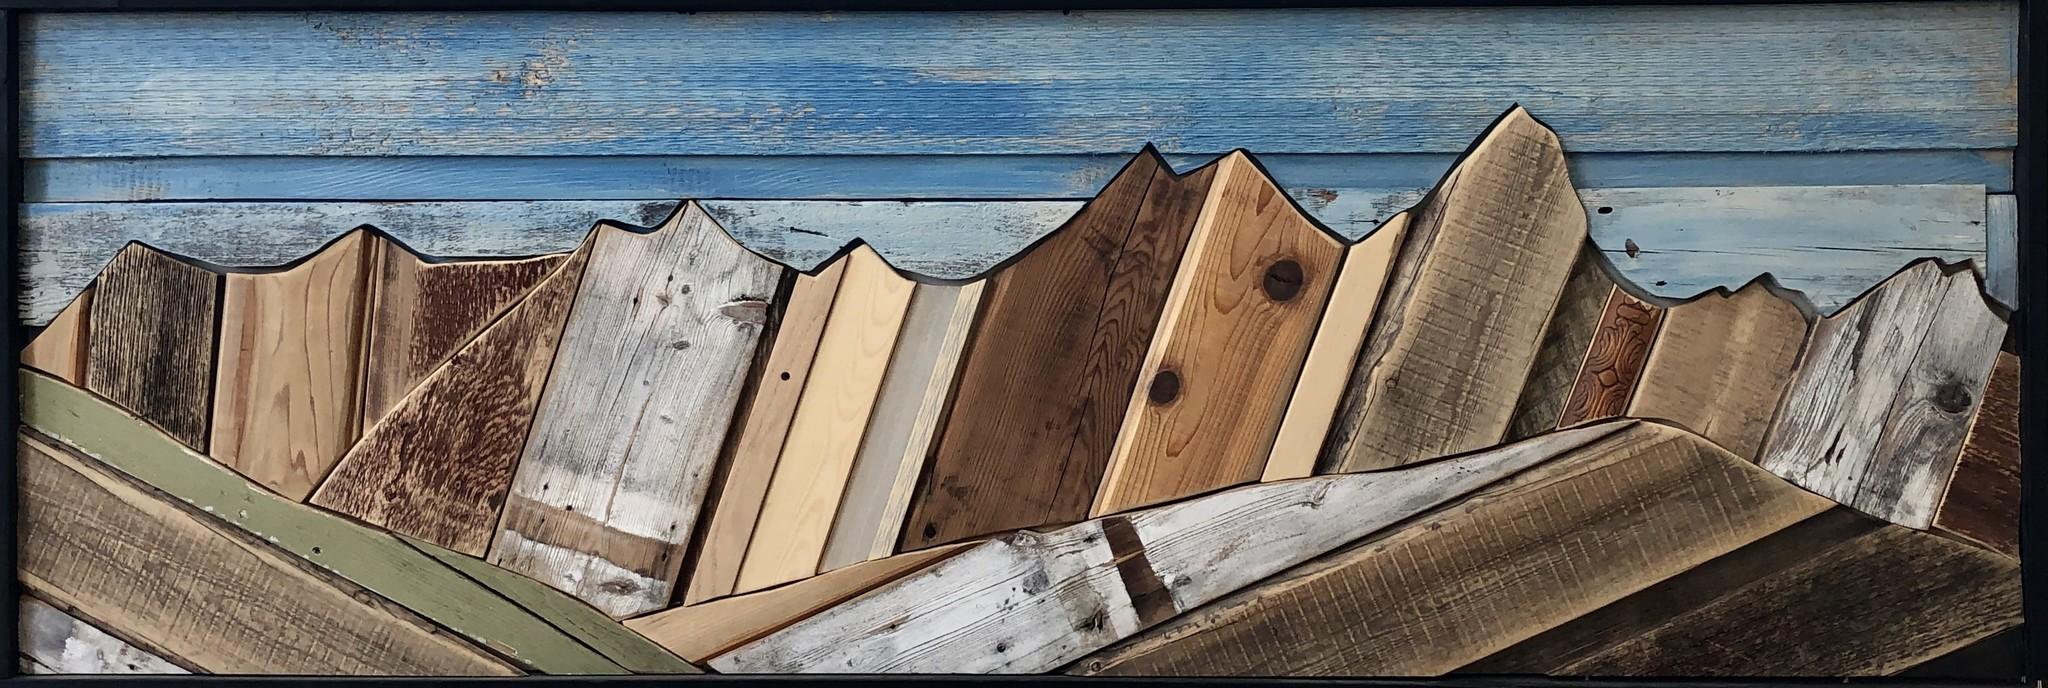 Amanda Krolczyk Amanda Krolczyk Wood Art